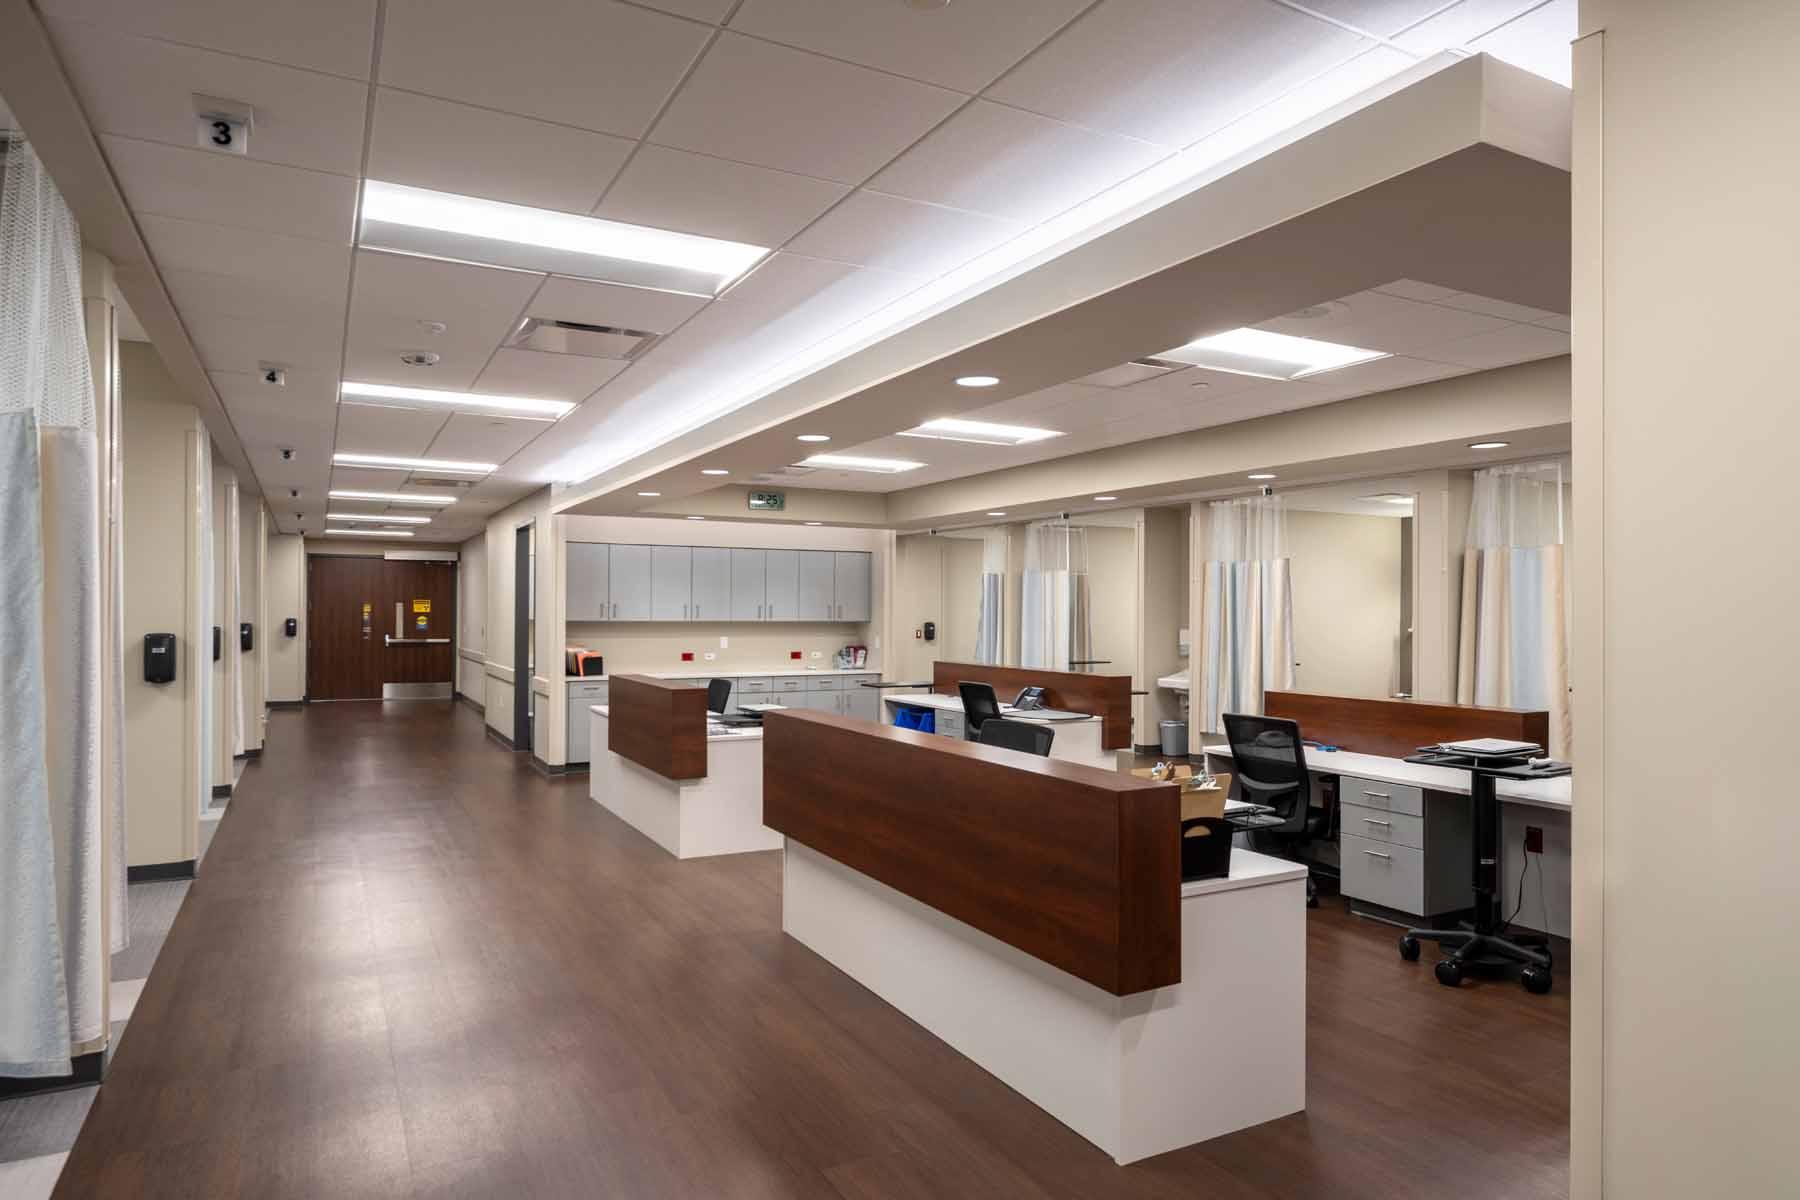 TSAOG Ridgewood Medical Office Building & Ambulatory Surgery Center Joeris